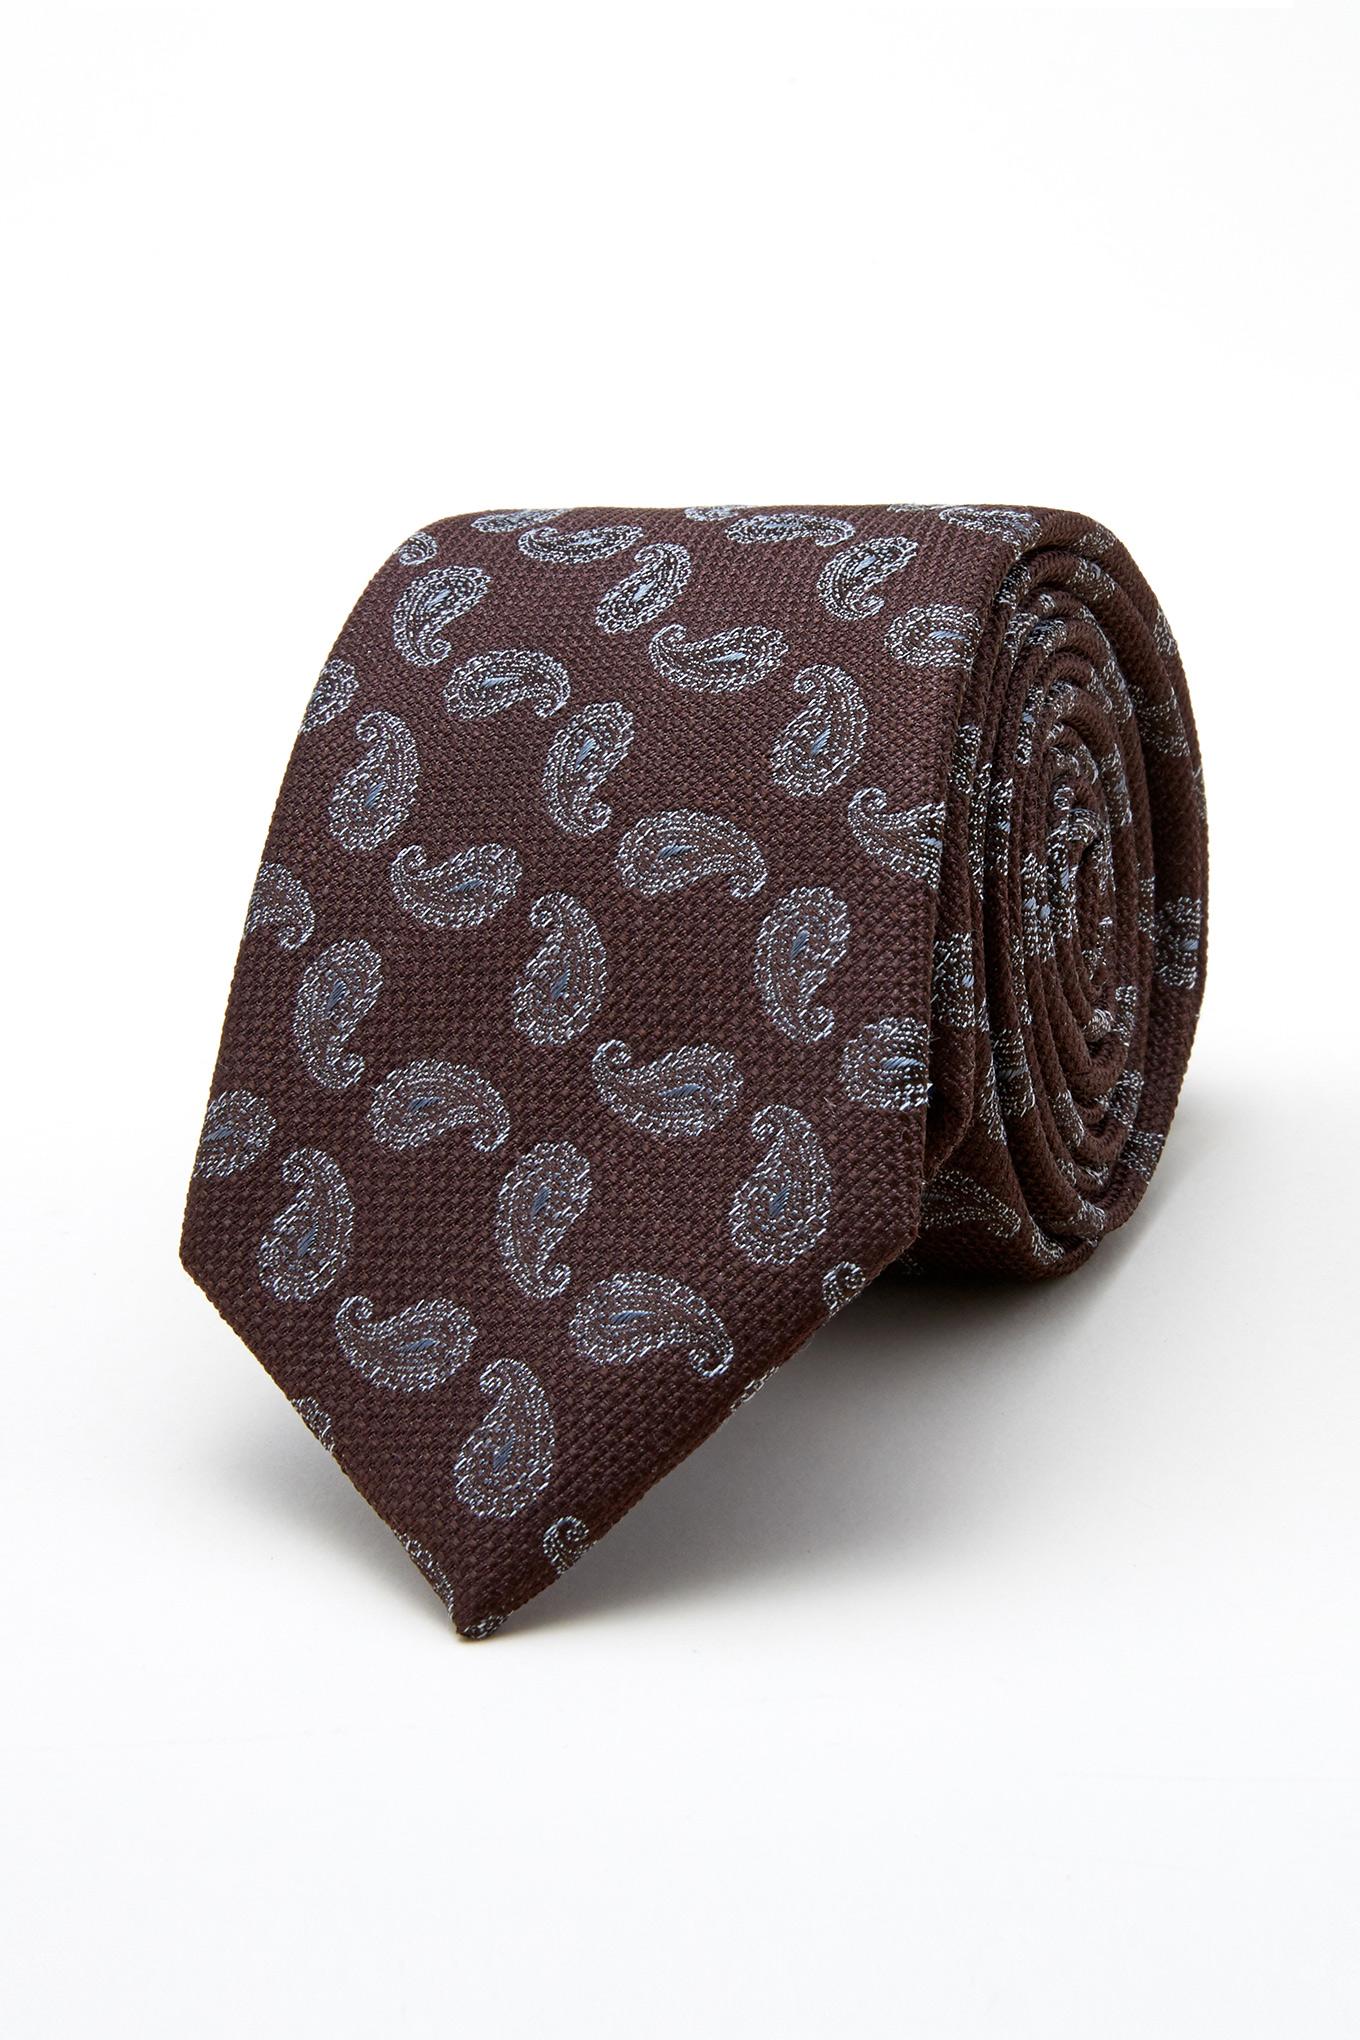 Tie Chocolate Classic Man